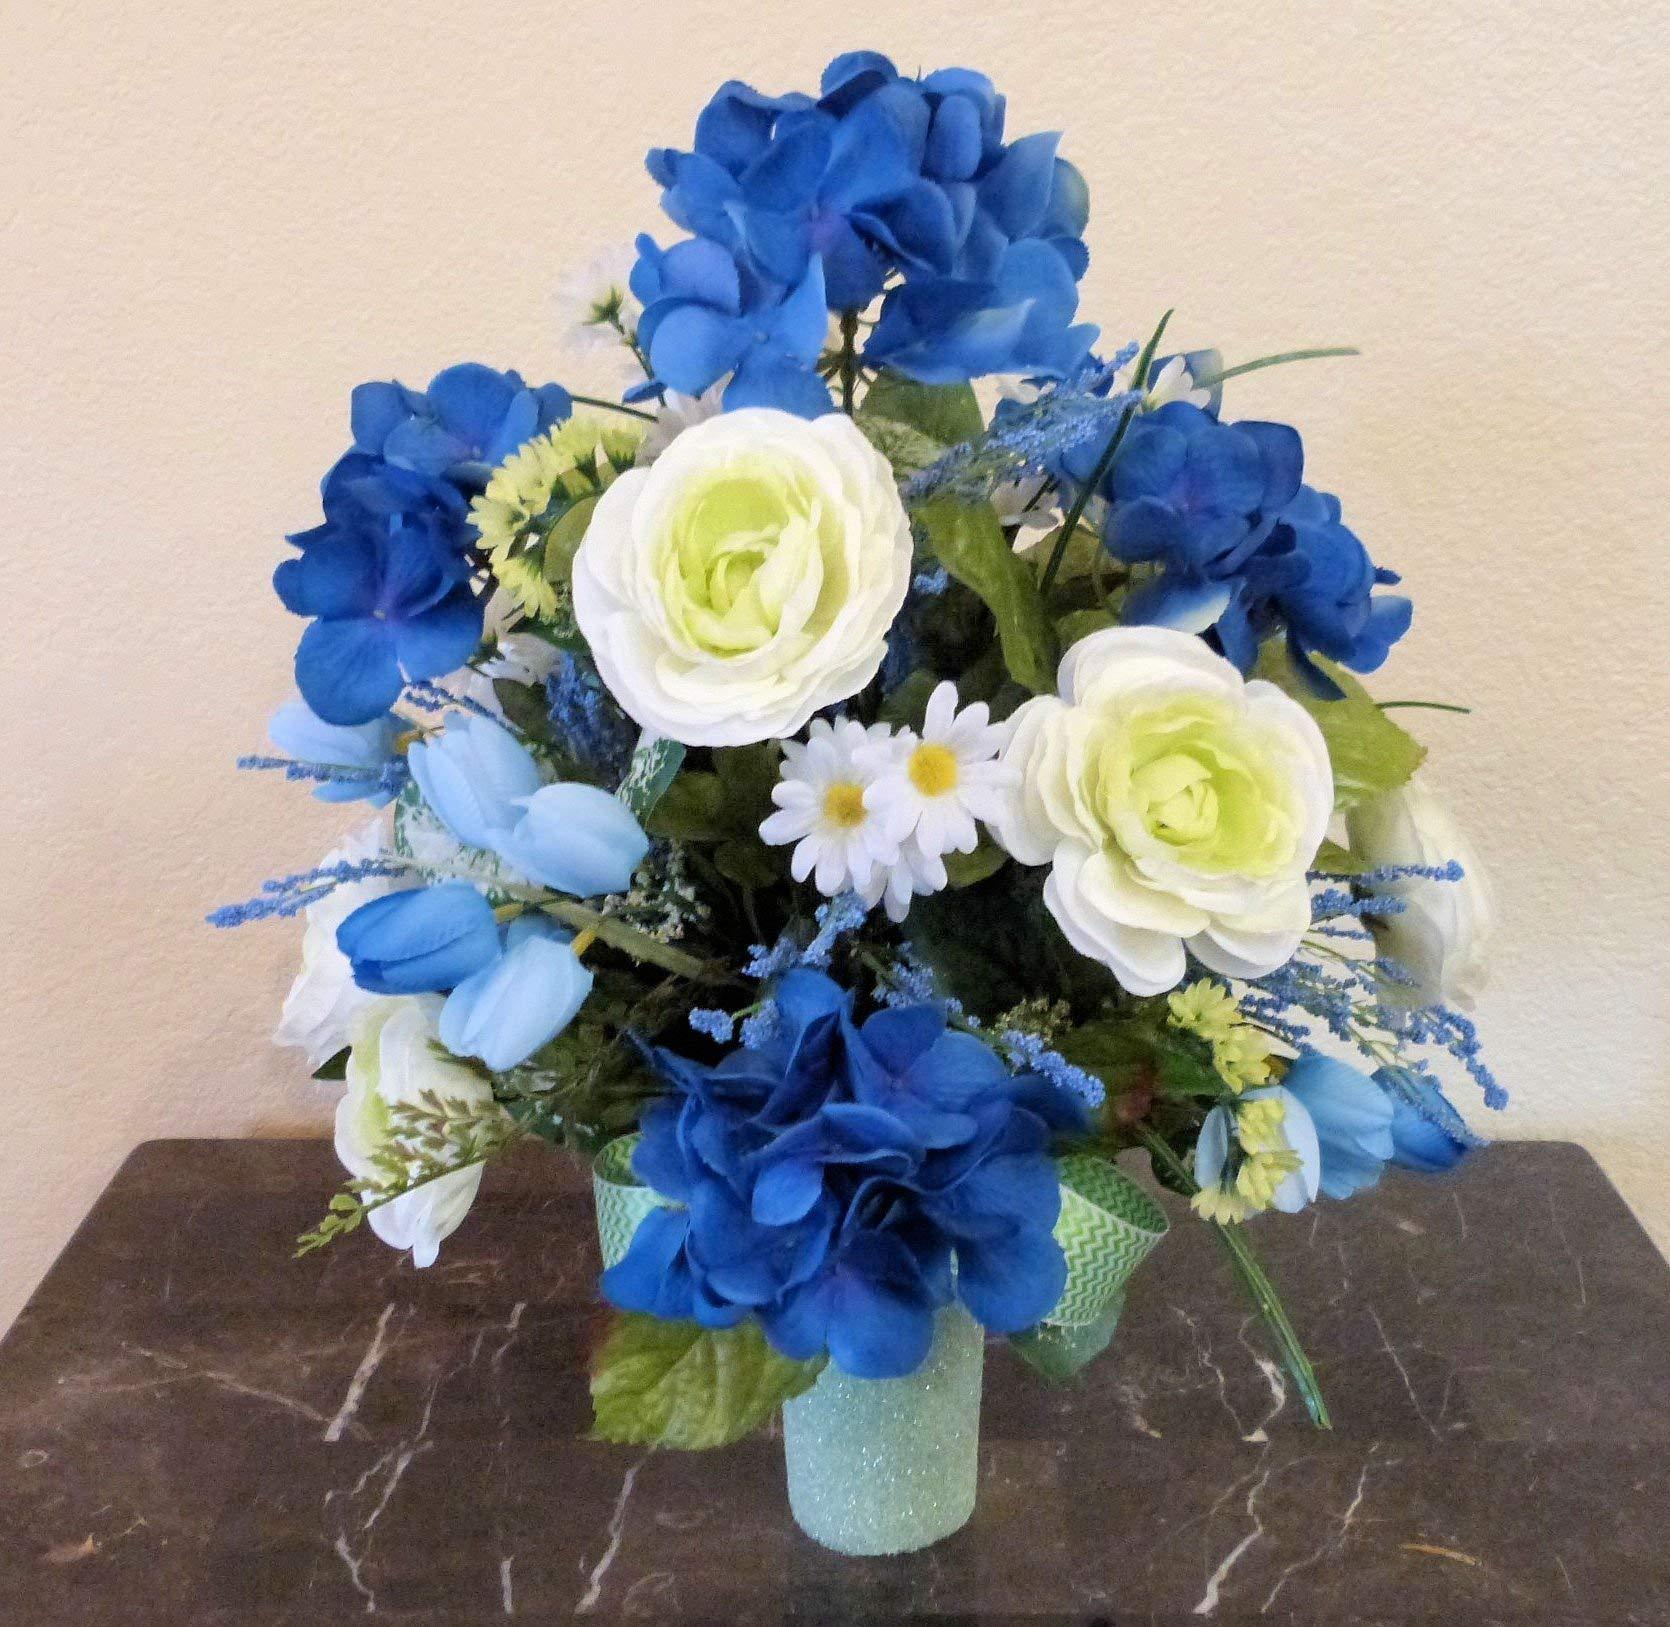 Blue-Hydrangea-Cemetery-Arrangement-Cemetery-Arrangement-with-Ranunculus-Flowers-For-Cemetery-Vase